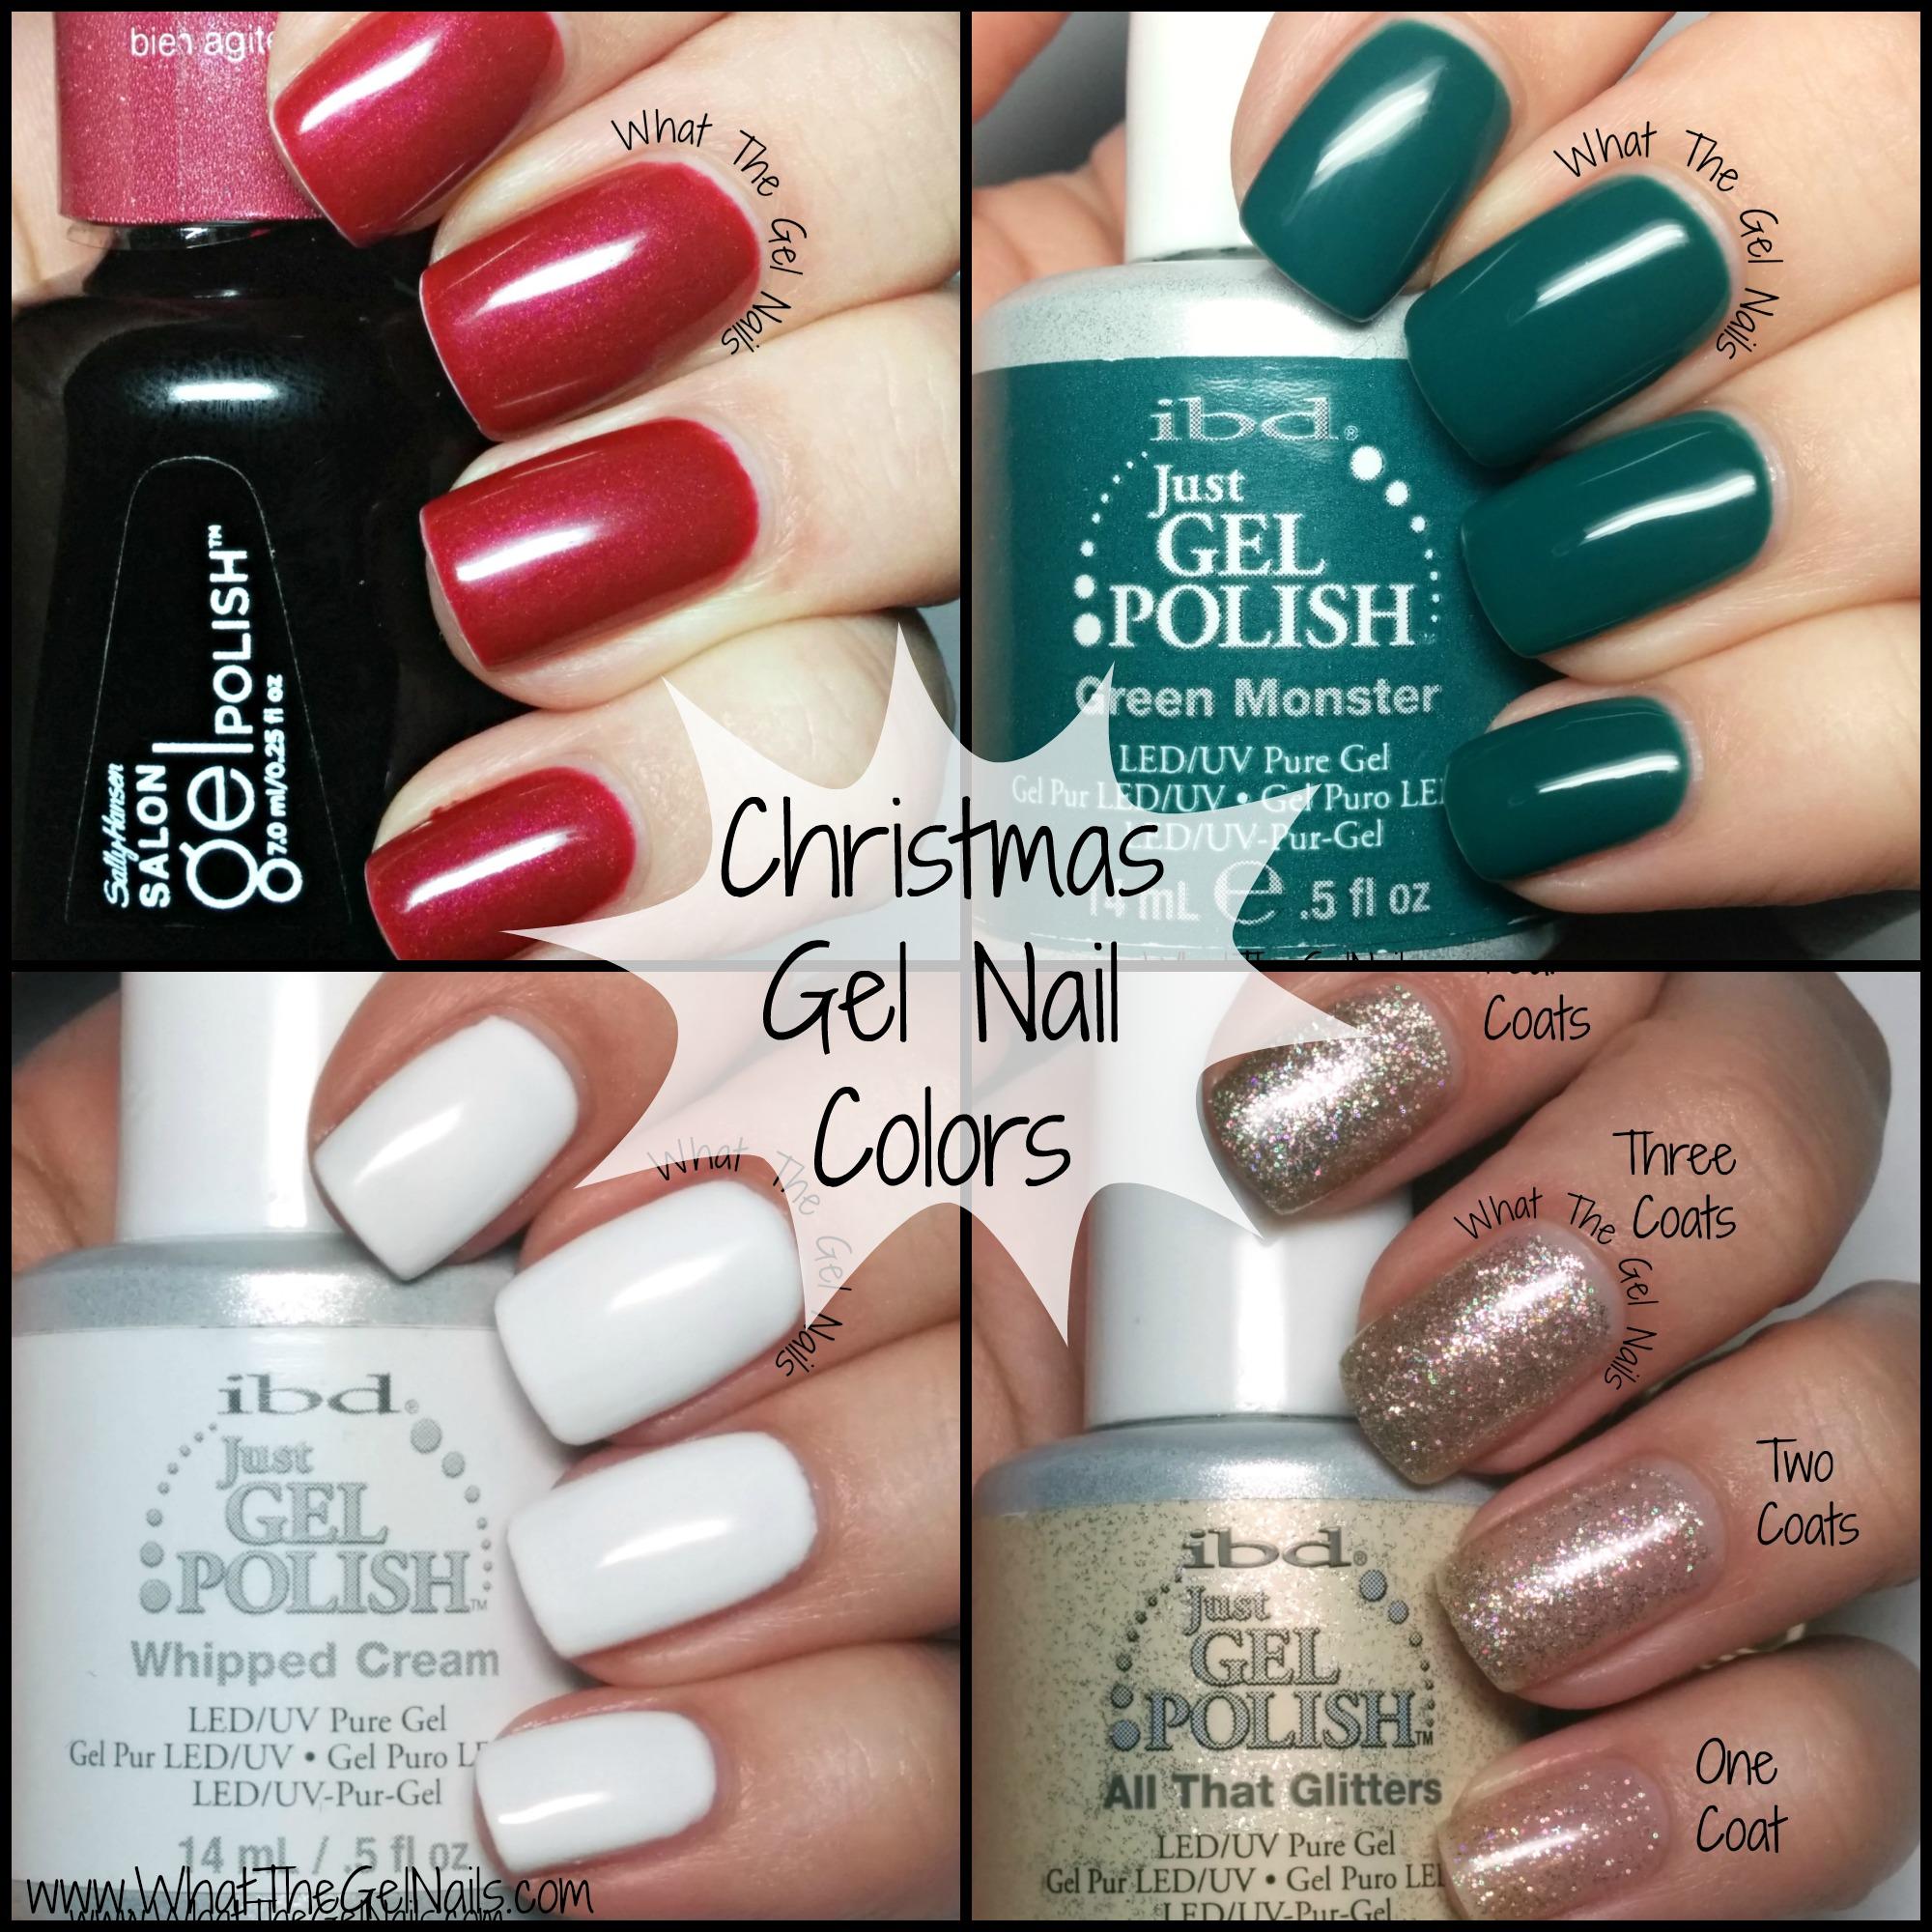 Gel nails colors - Expression Nails